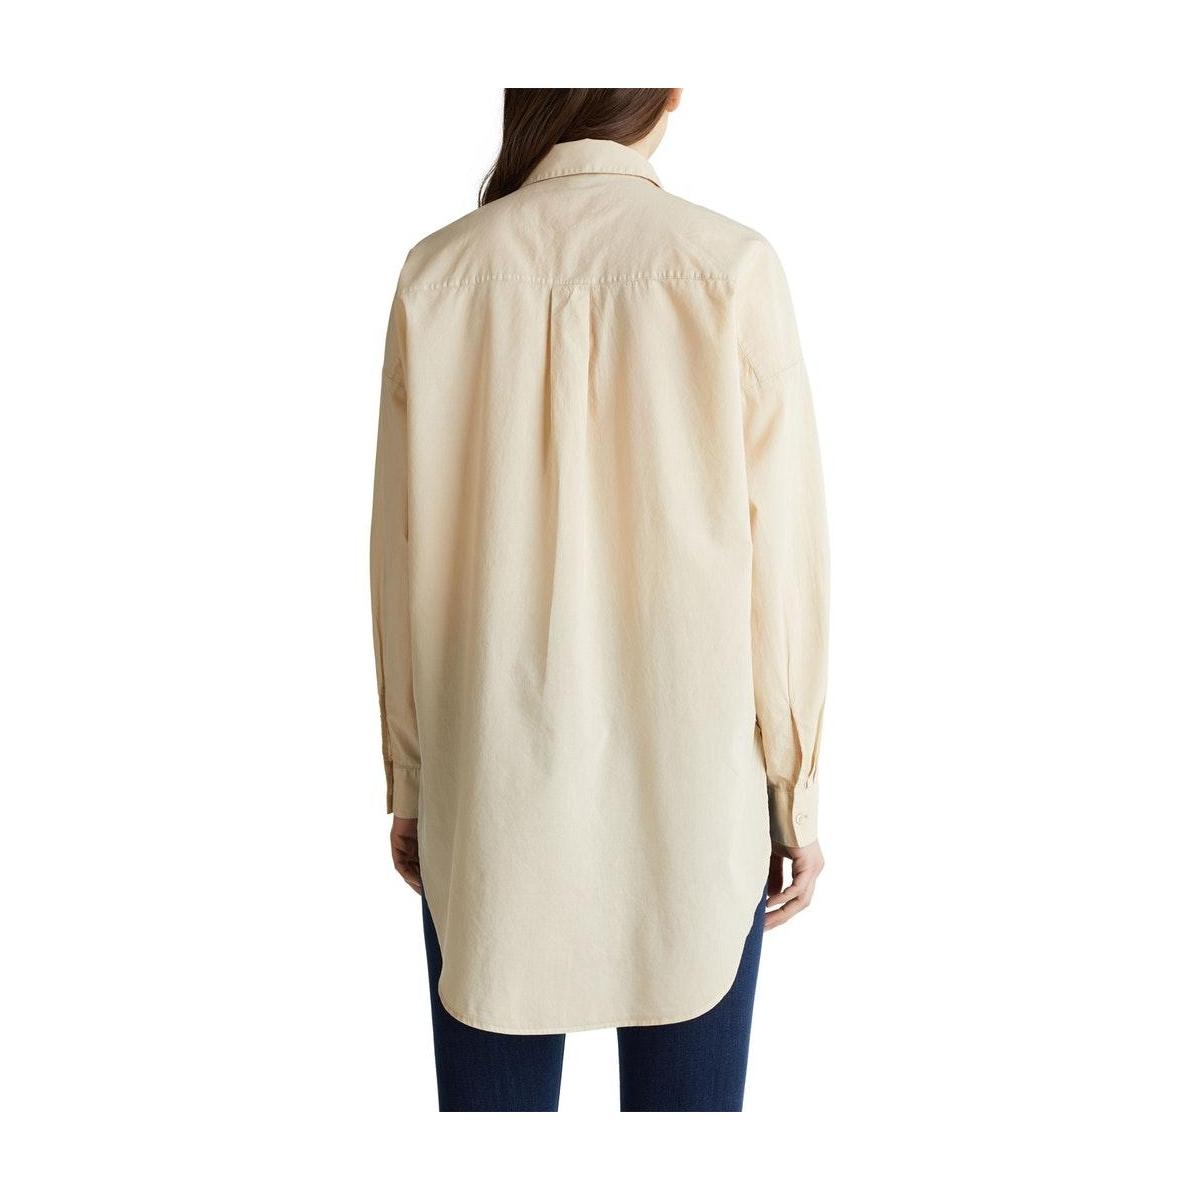 blouse met borstzak 040ee1f323 esprit blouse e285